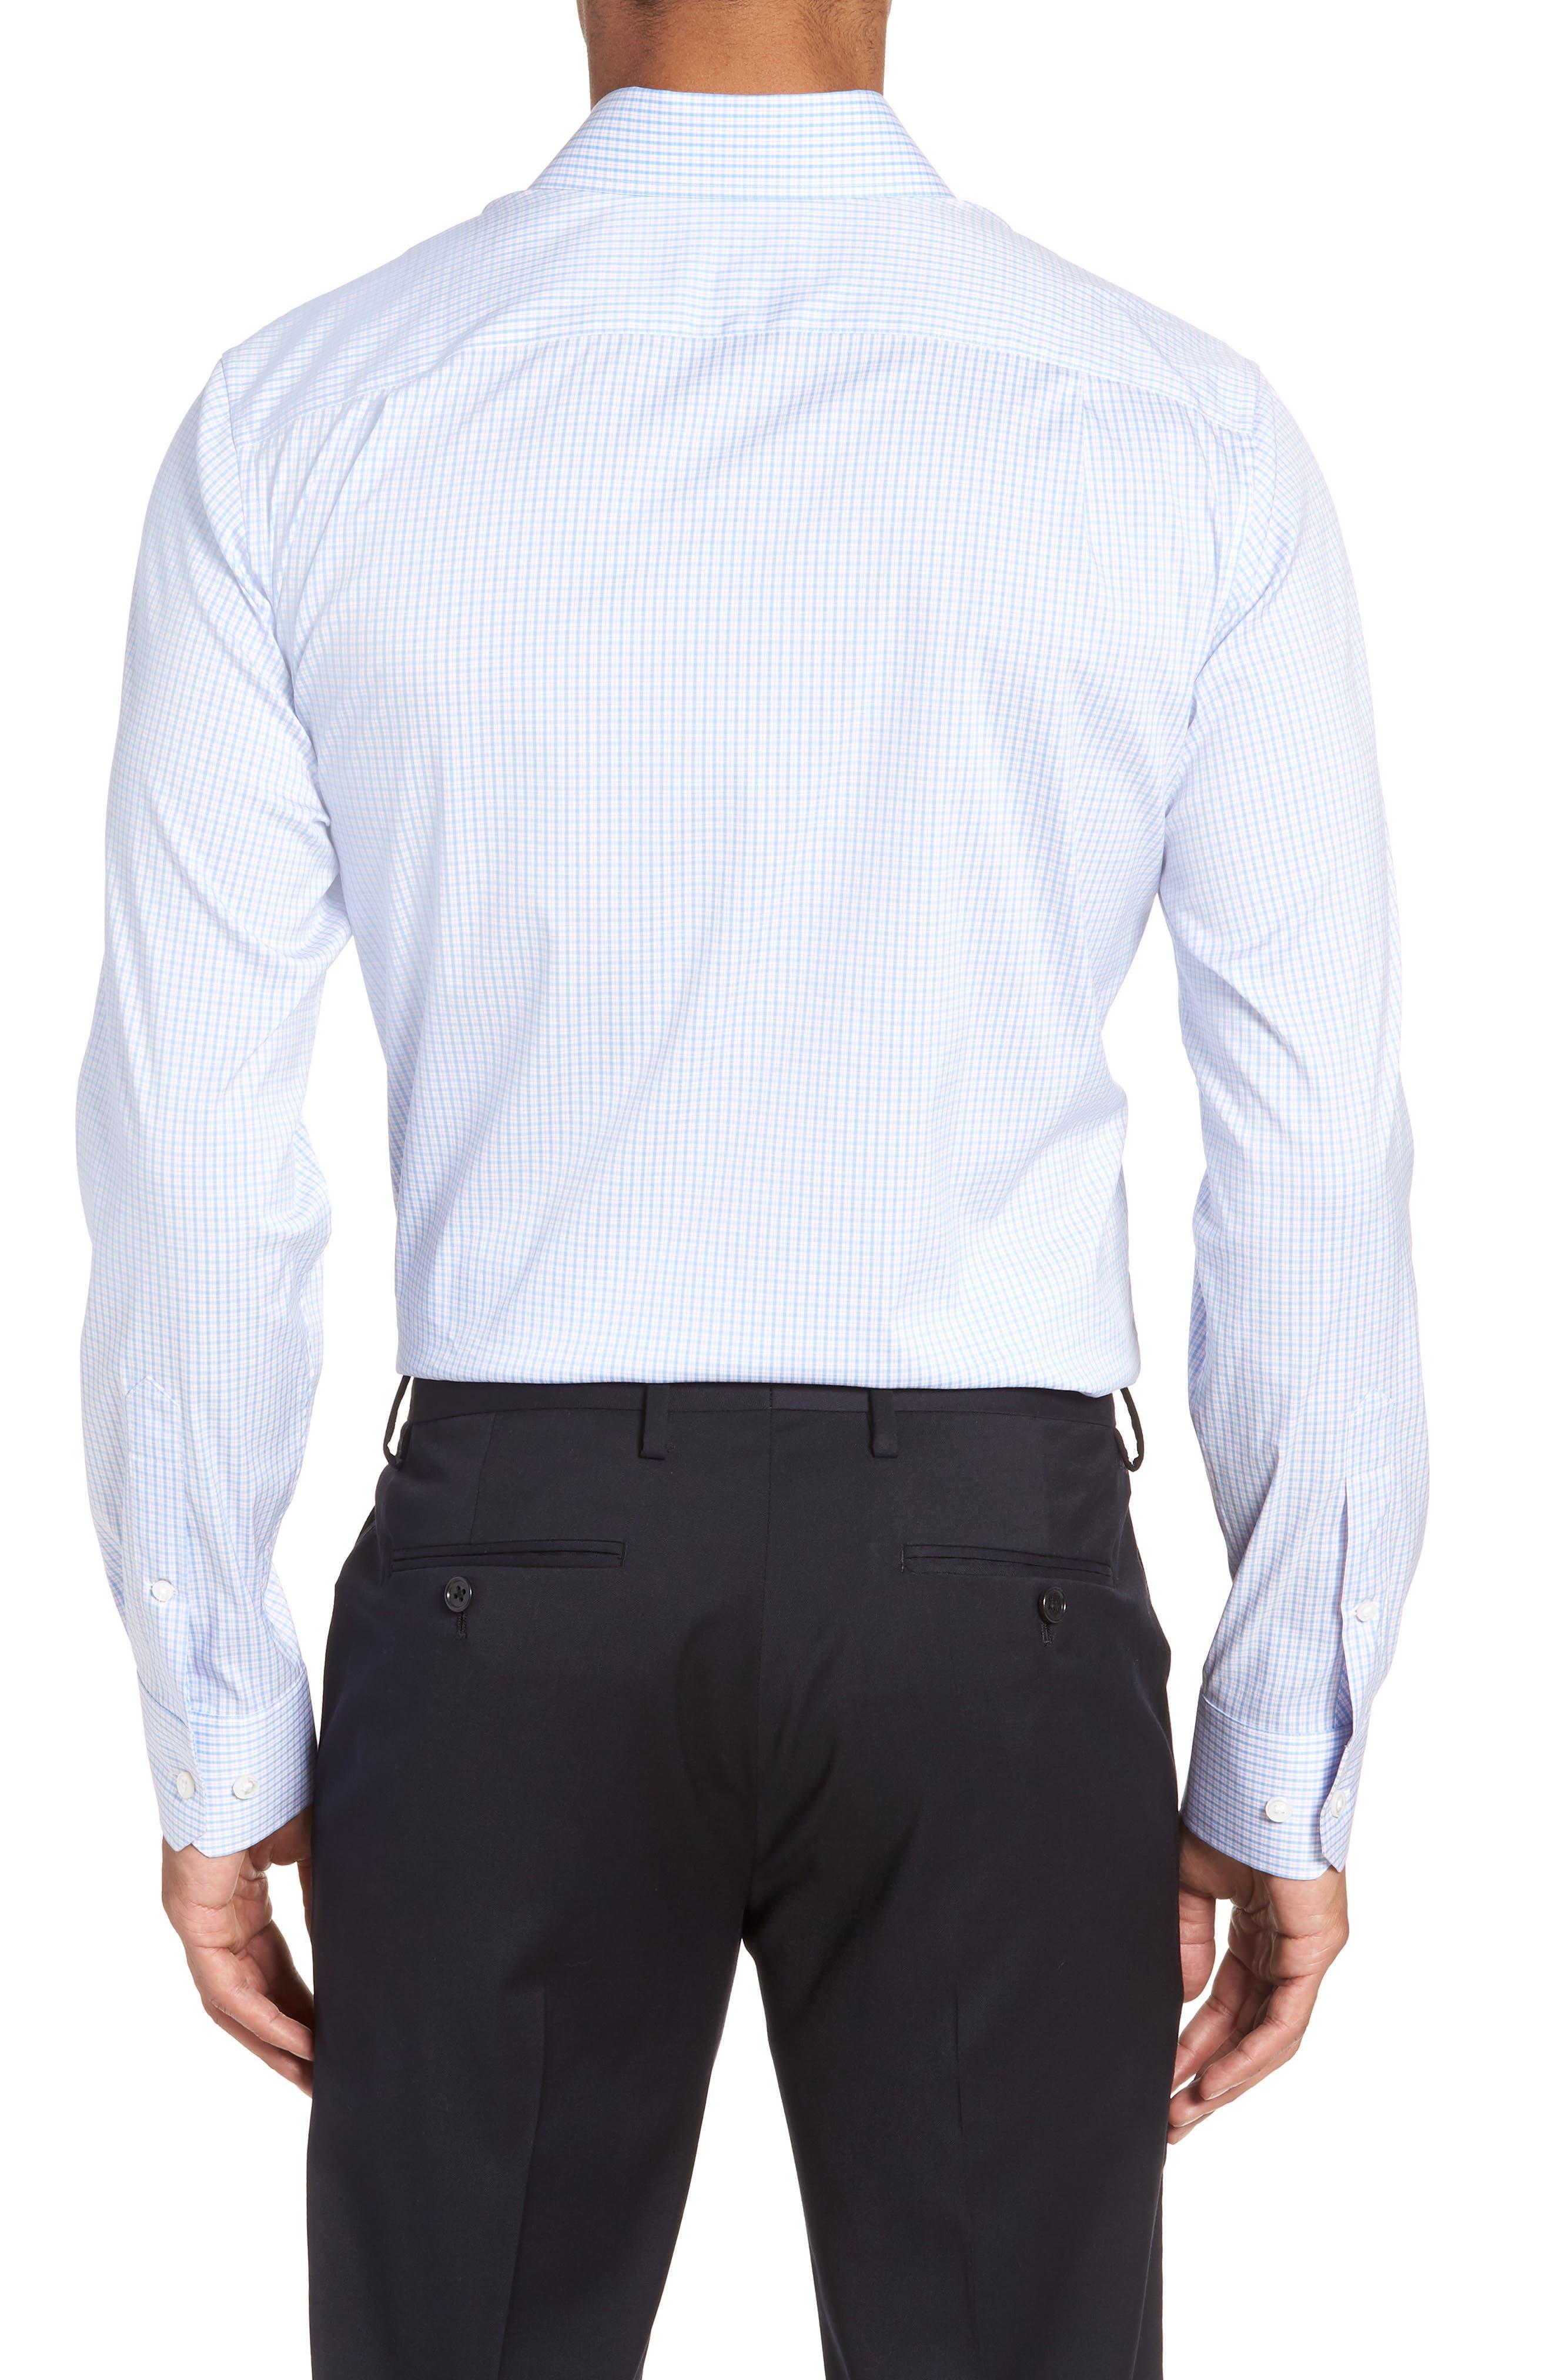 Soundview Slim Fit Stretch Check Dress Shirt,                             Alternate thumbnail 3, color,                             400